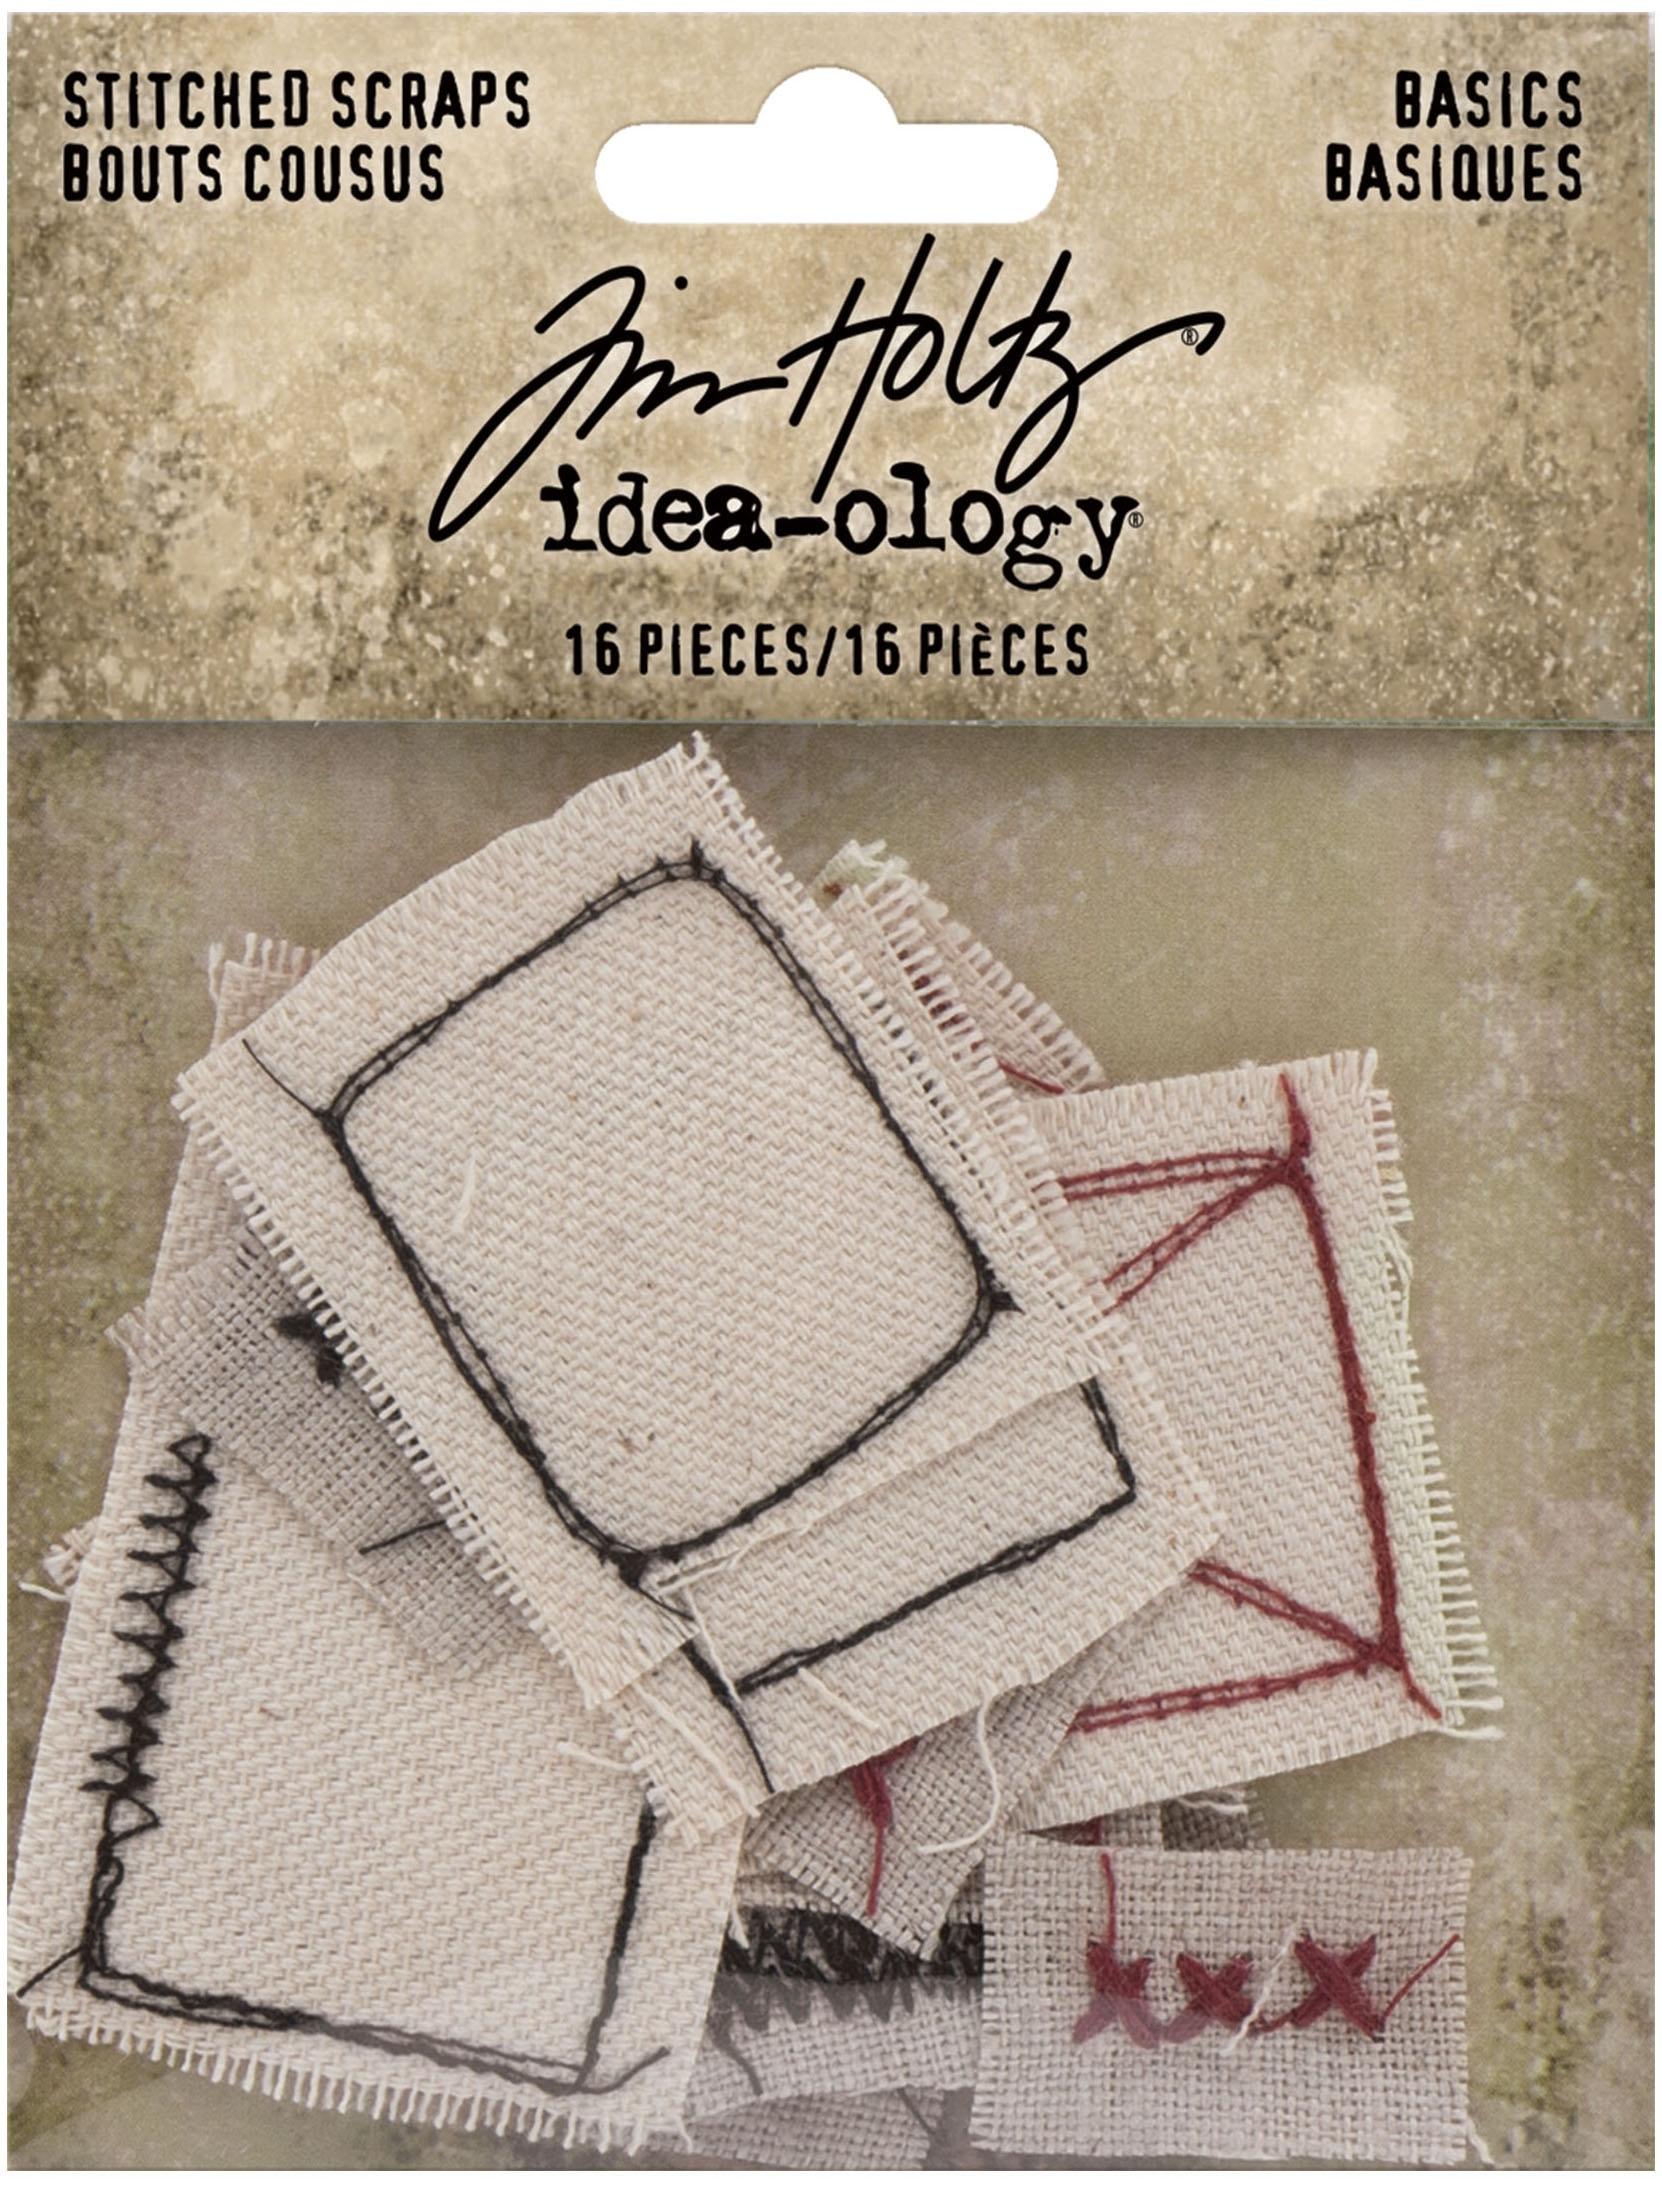 Idea-Ology Stitched Scraps 16/Pkg-Basics